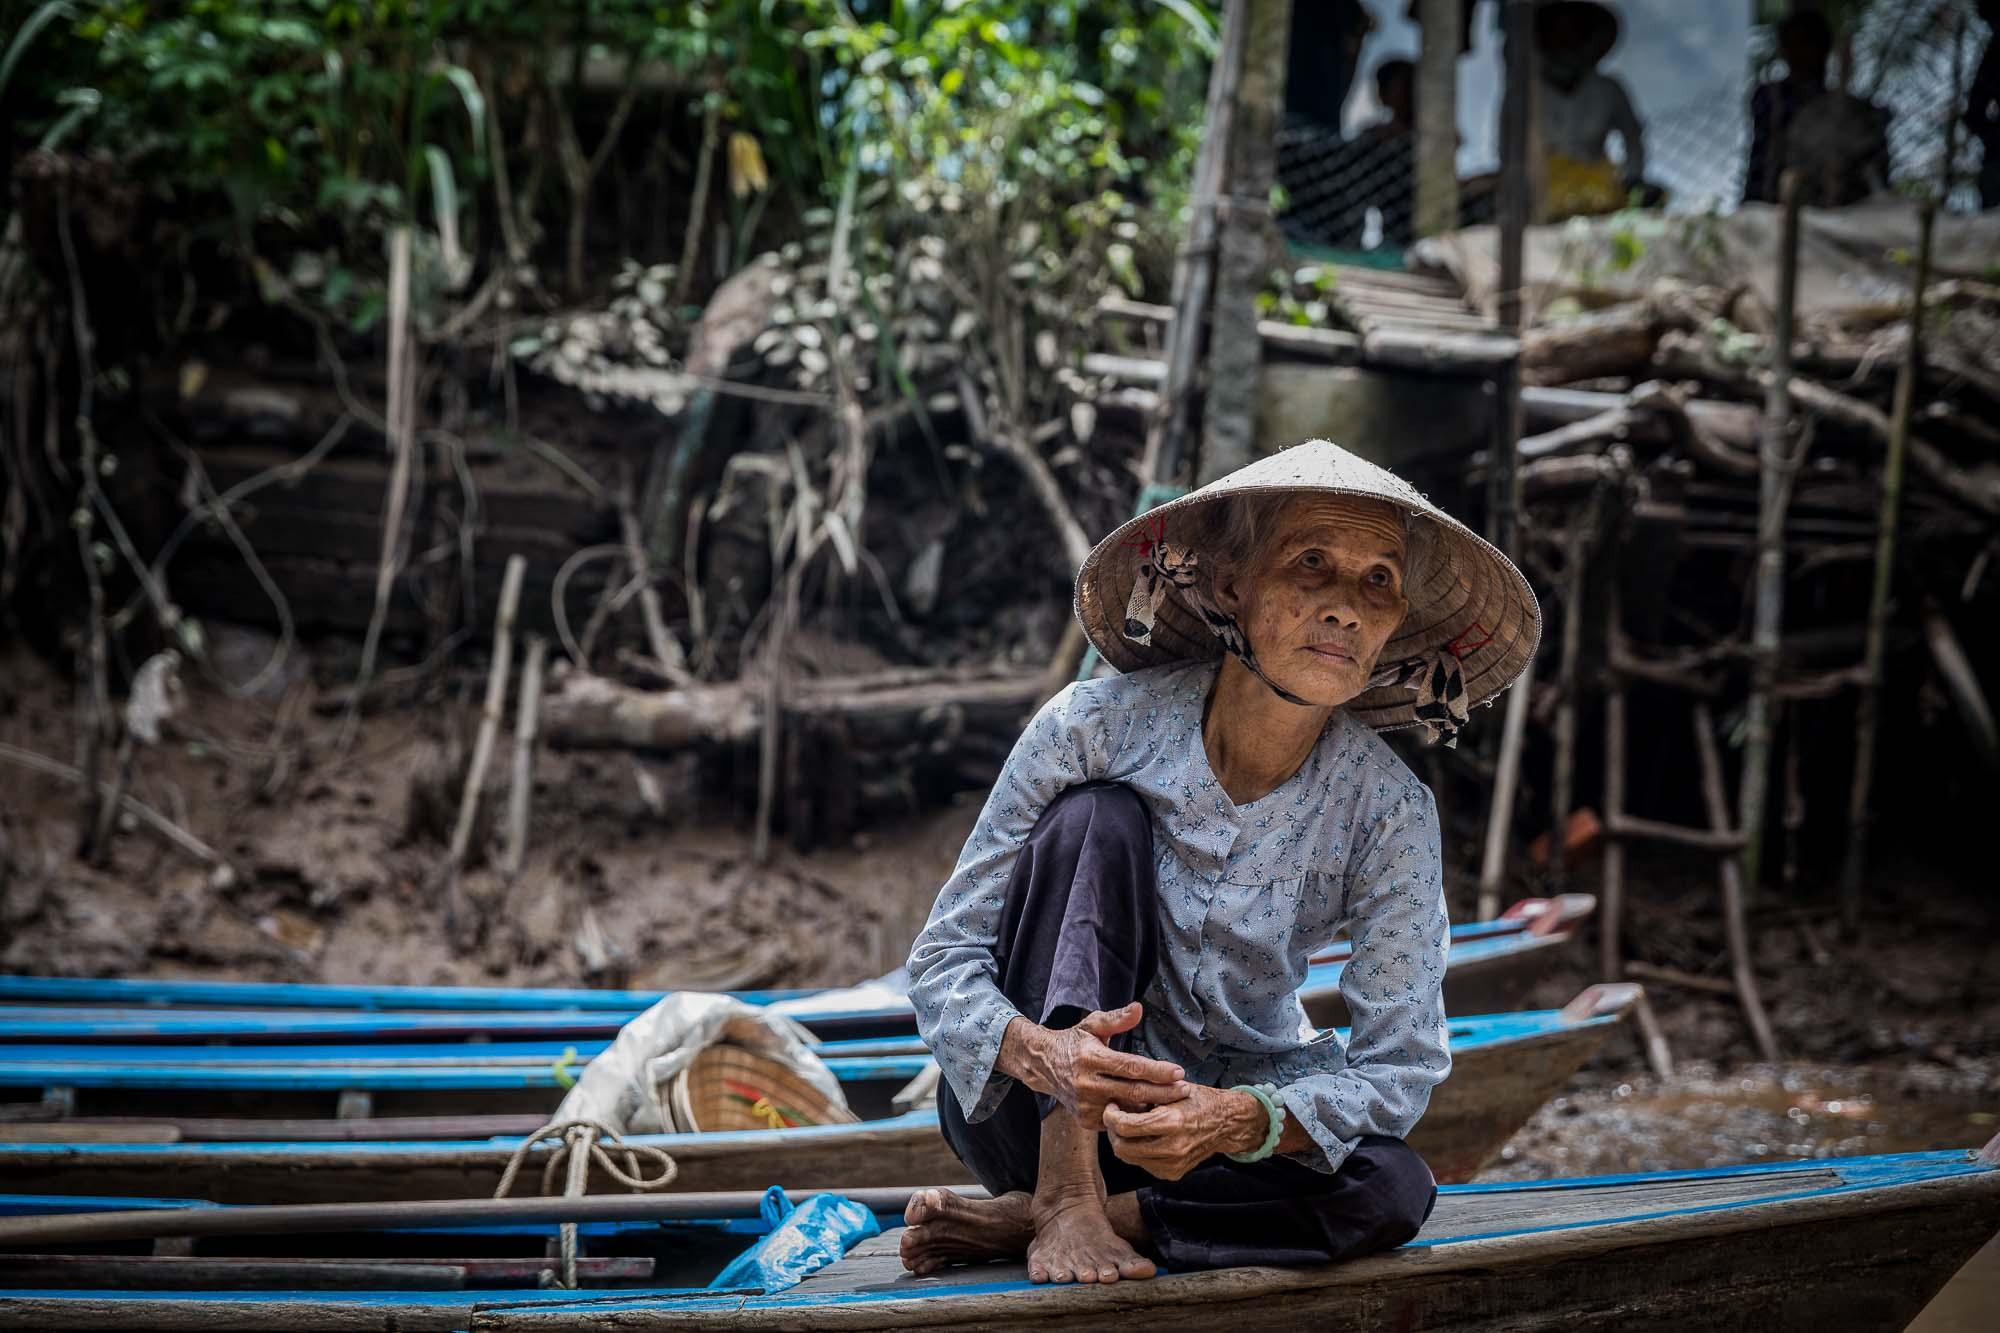 vietnam_2016_hcmc_jusmedic_244